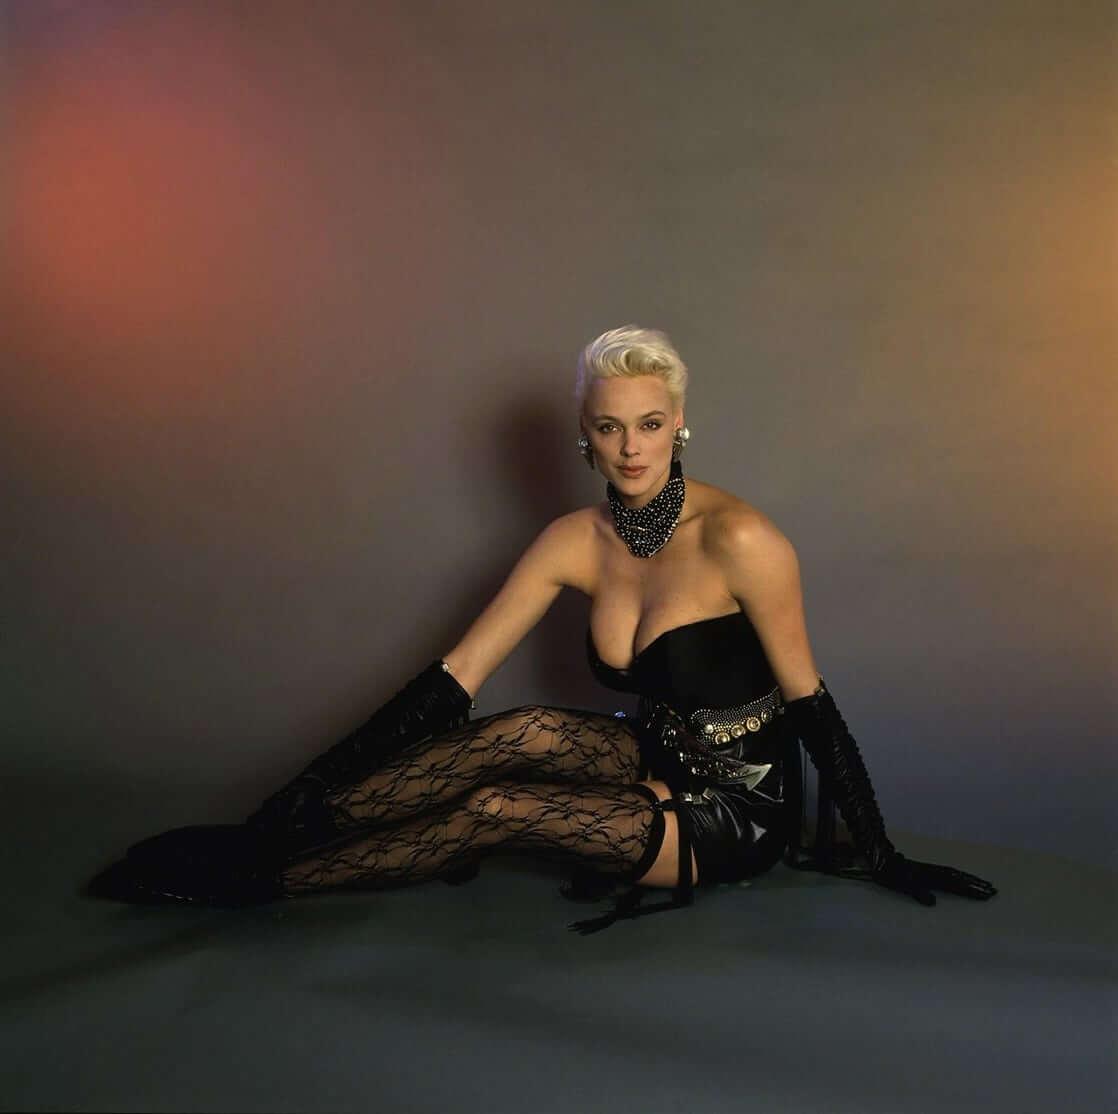 Brigitte Nielsen sexy pictures